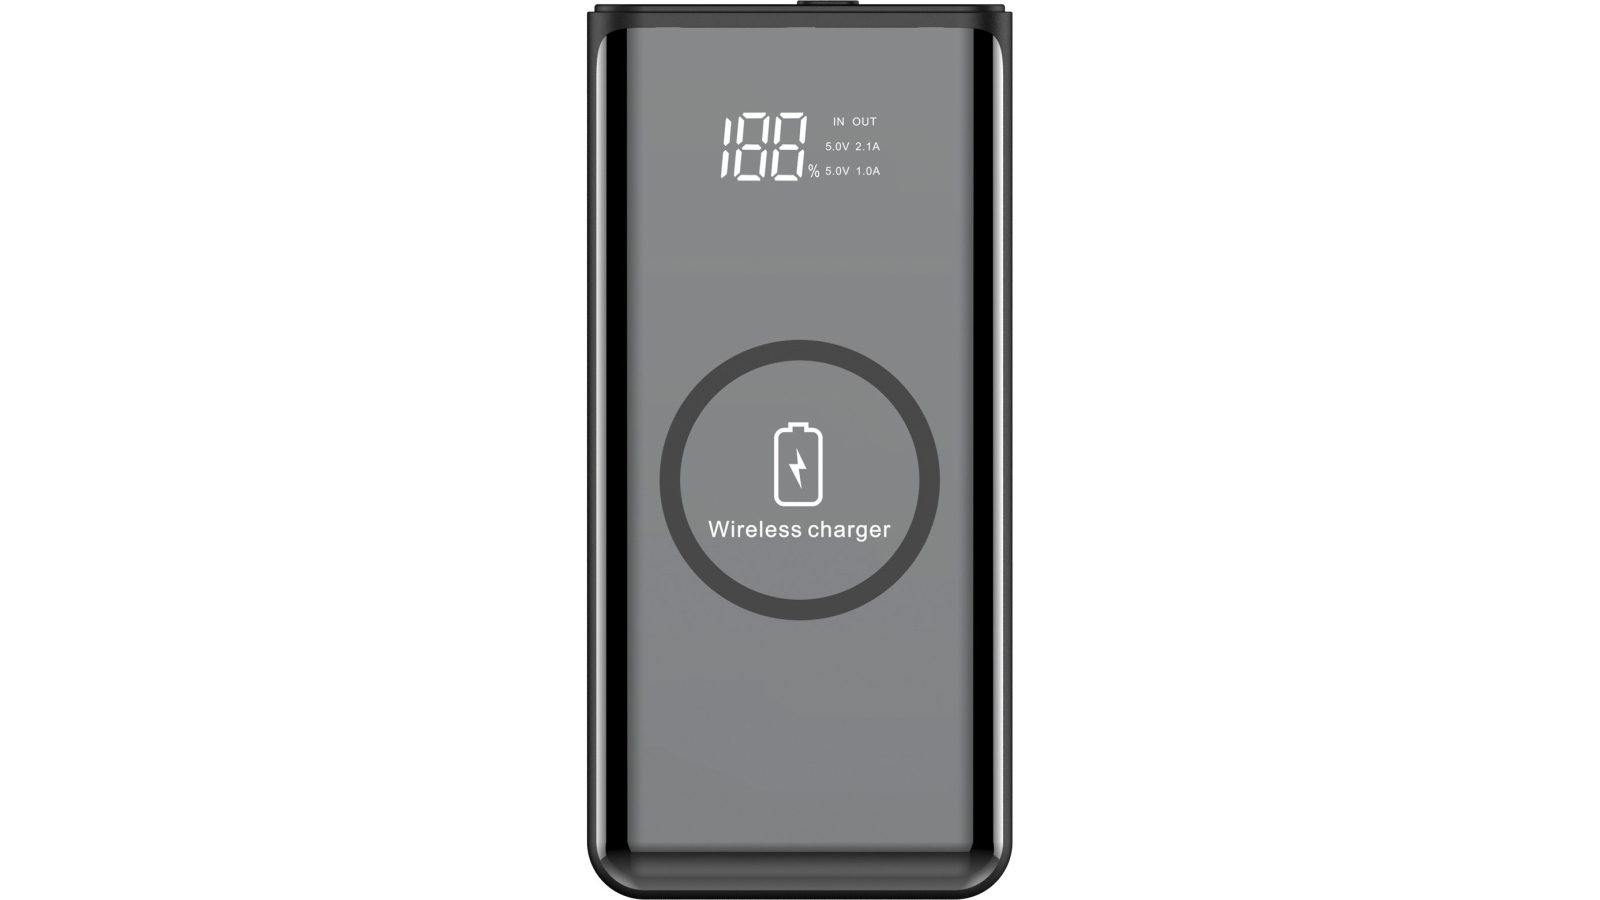 buy raw audio 10000mah wireless power bank harvey norman au rh harveynorman com au